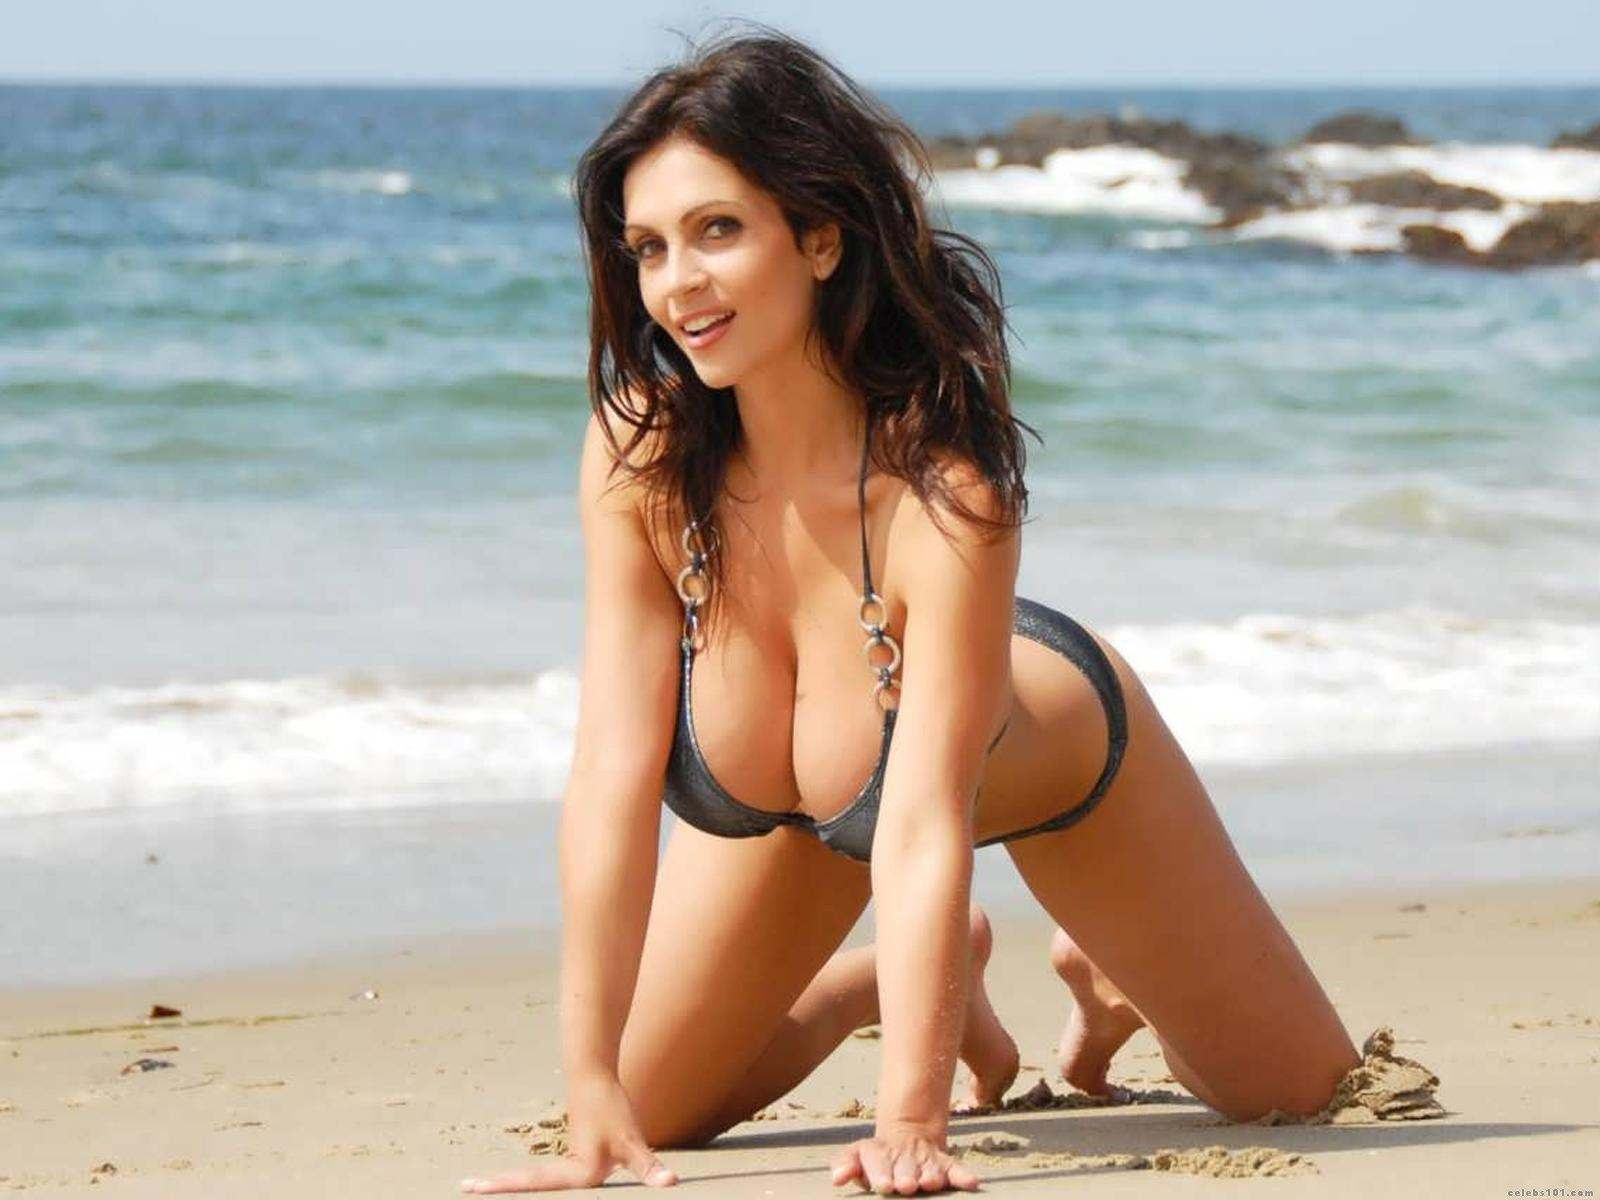 Adult Picture: cryangel-mylife.blogspot.com